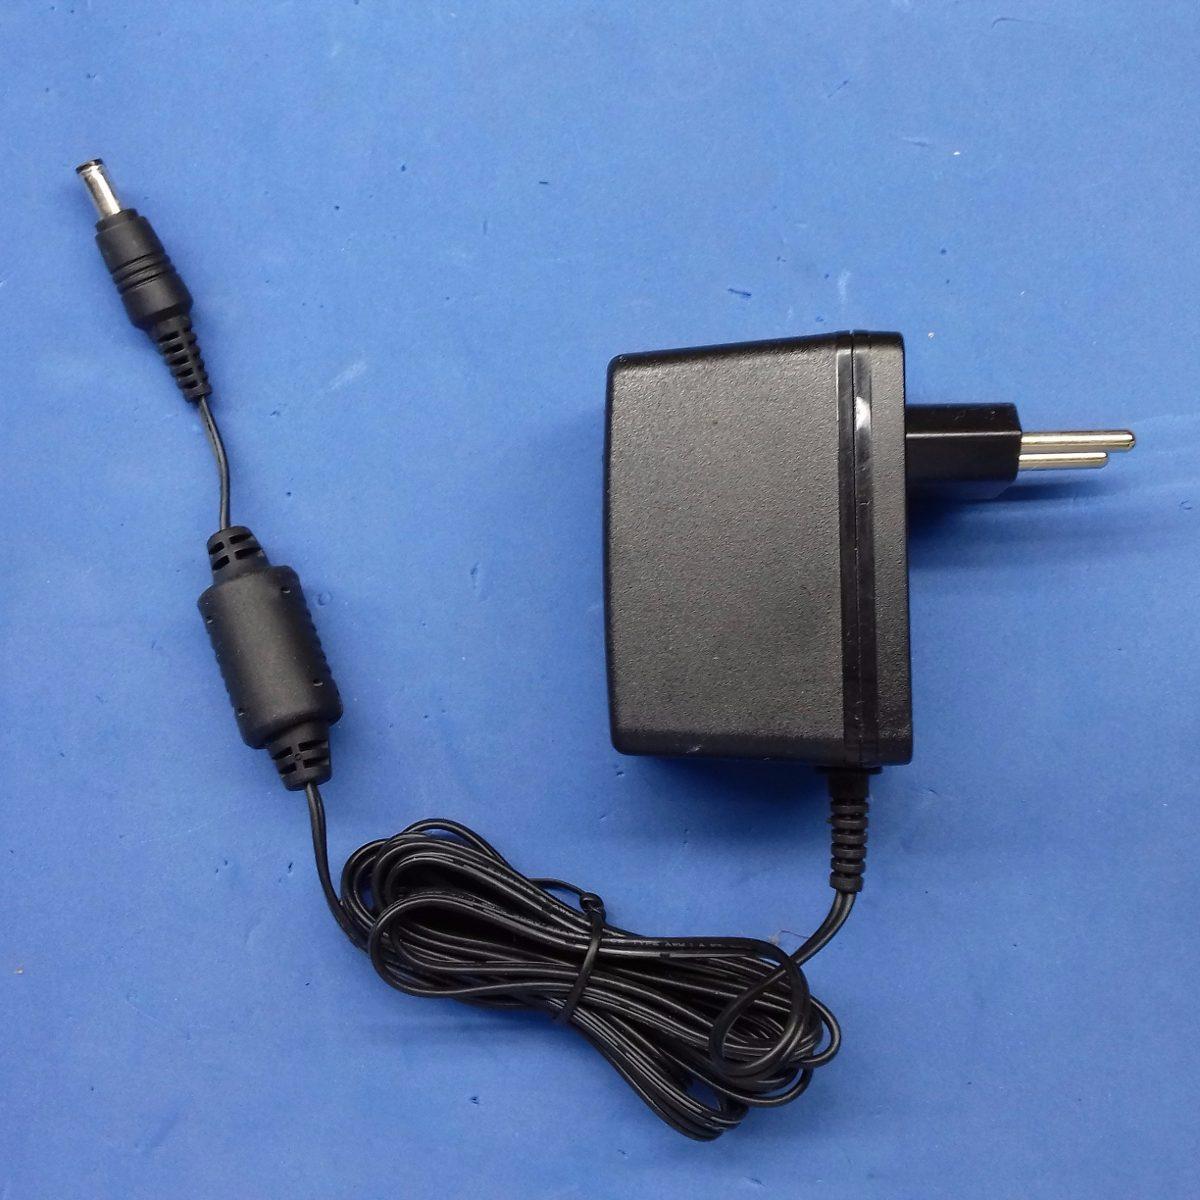 73e31185125 Fonte Teclado Casio Ad-5 Ad-5e Ad-5el Ad-5ml 9v 1000ma Nova - R  13 ...